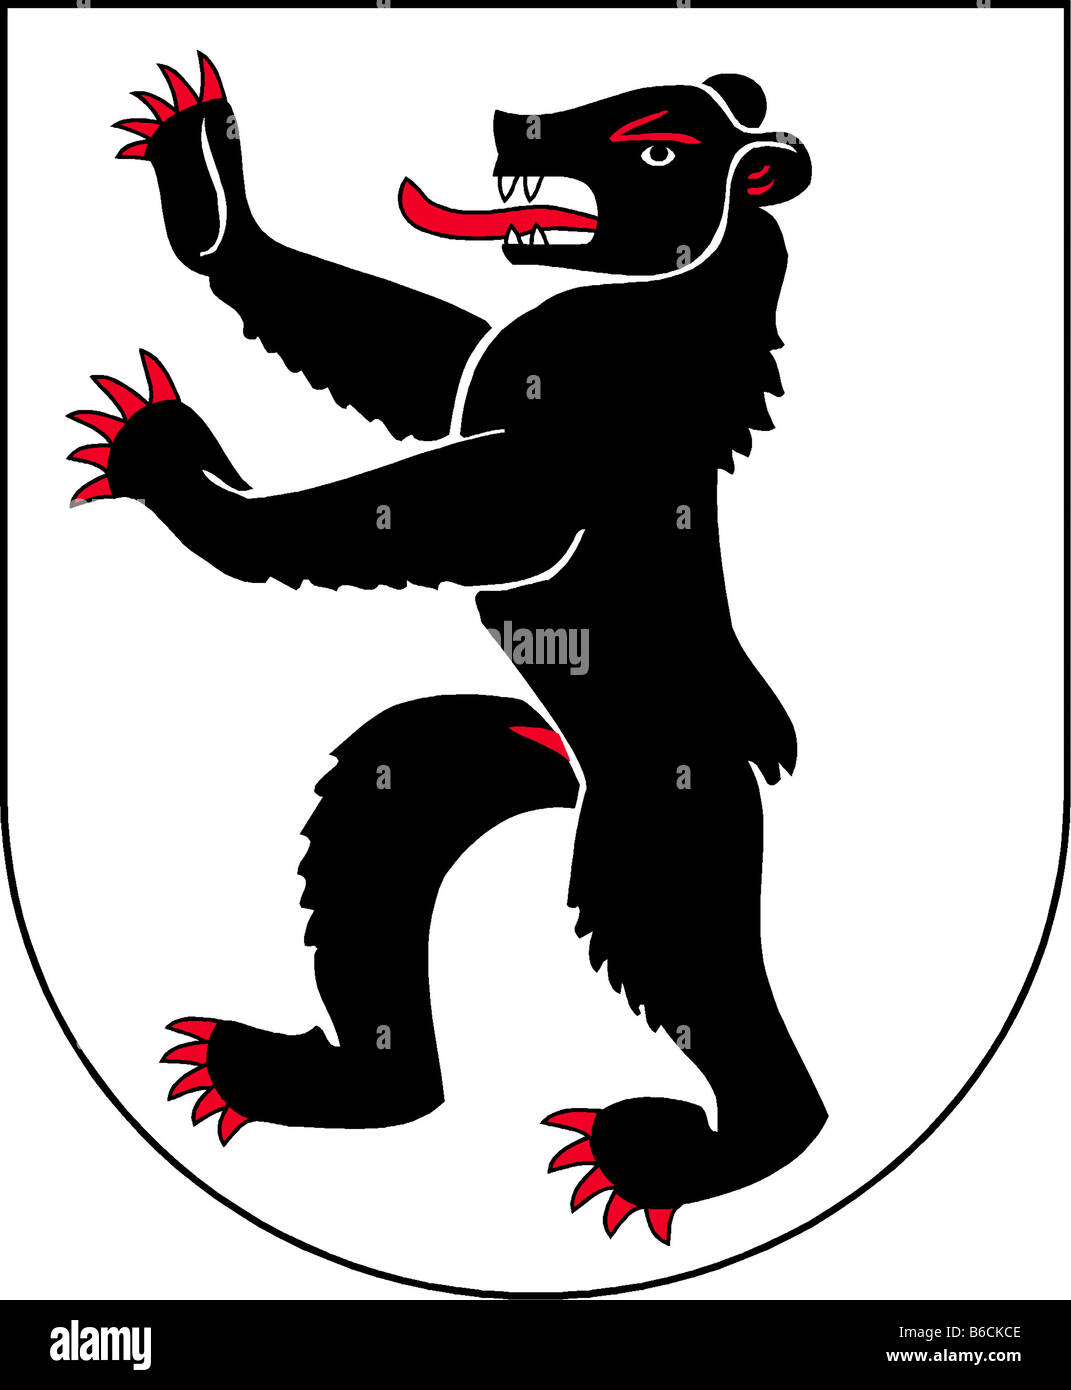 illustration flag of canton of appenzell innerrhoden switzerland - Stock Image